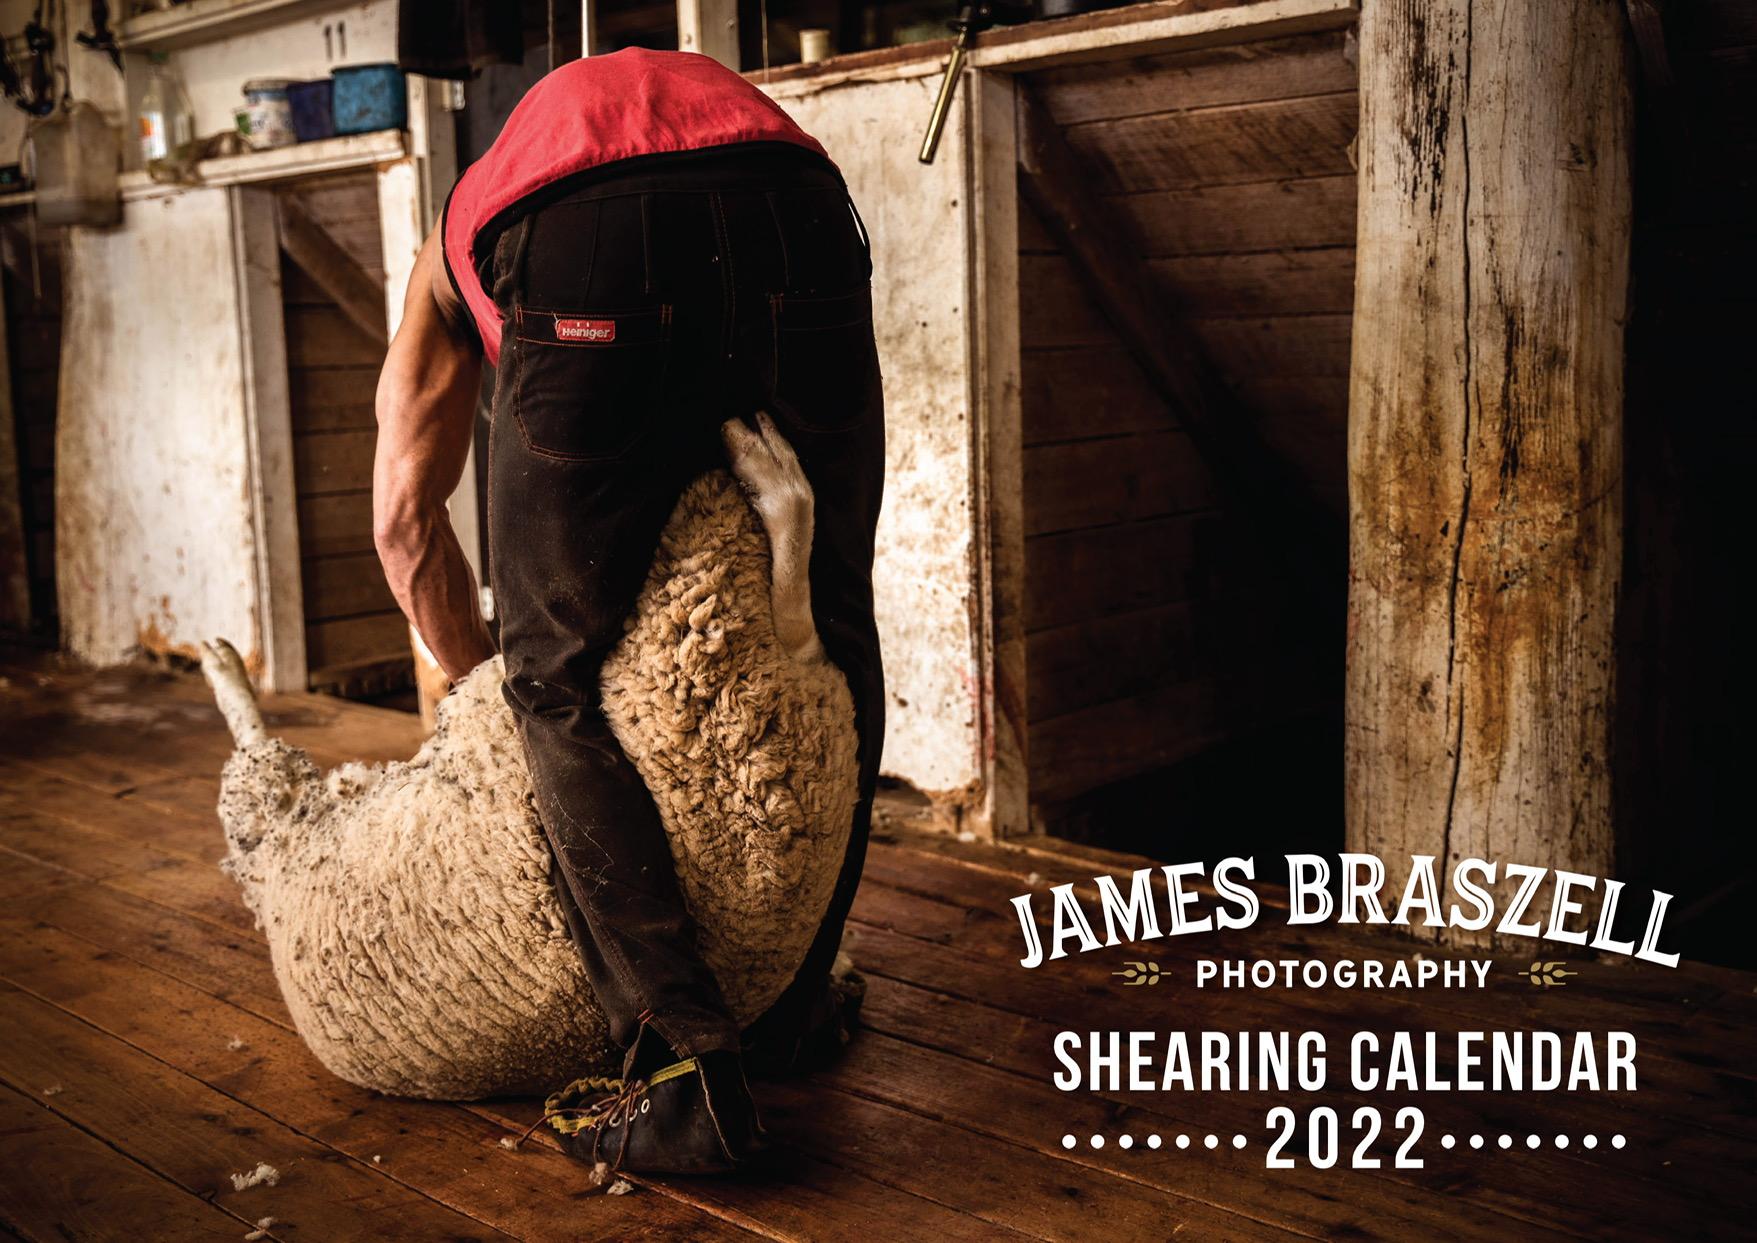 JamesBraszell 2022Calendar HRCoverImage — James Braszell Photography